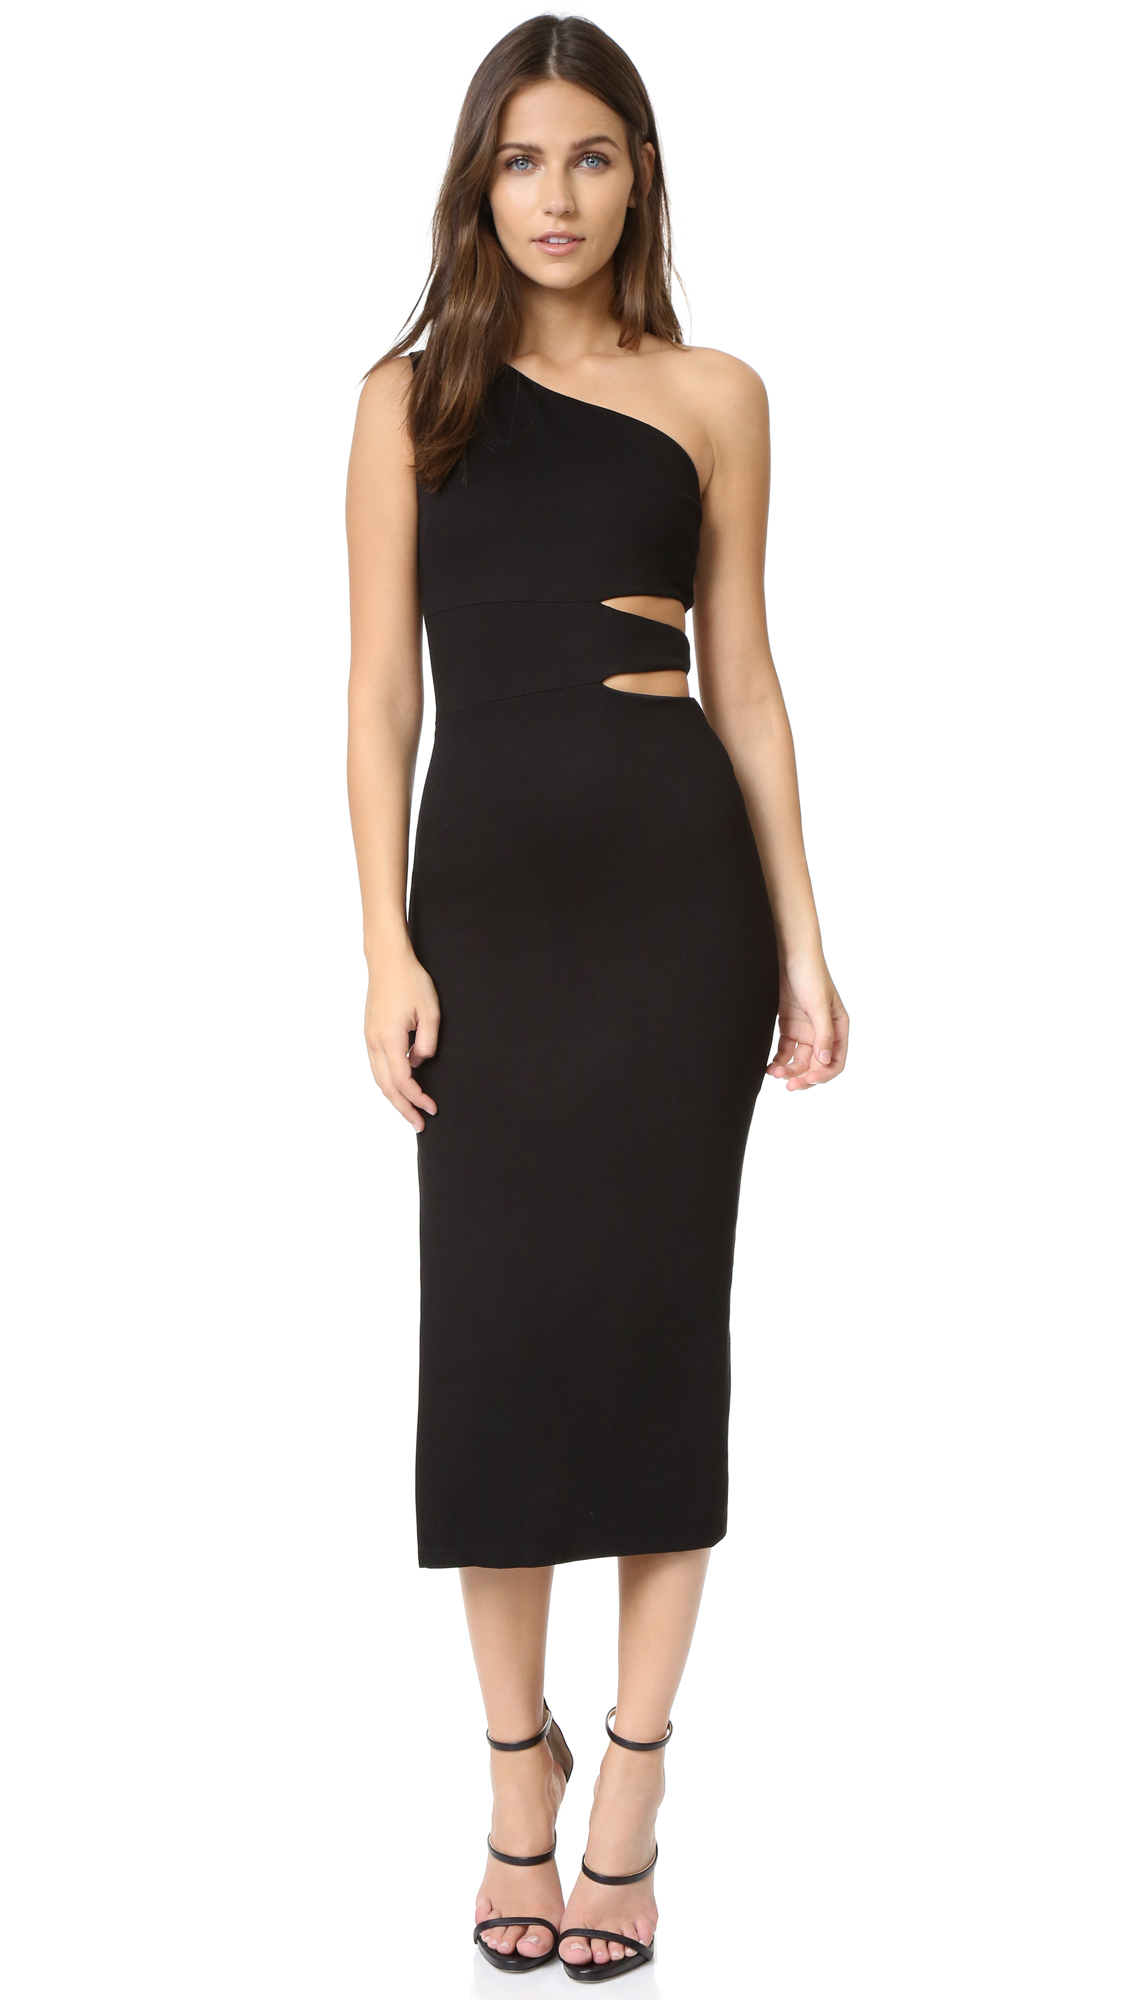 Alice + Olivia Margo Dress - Black at Shopbop